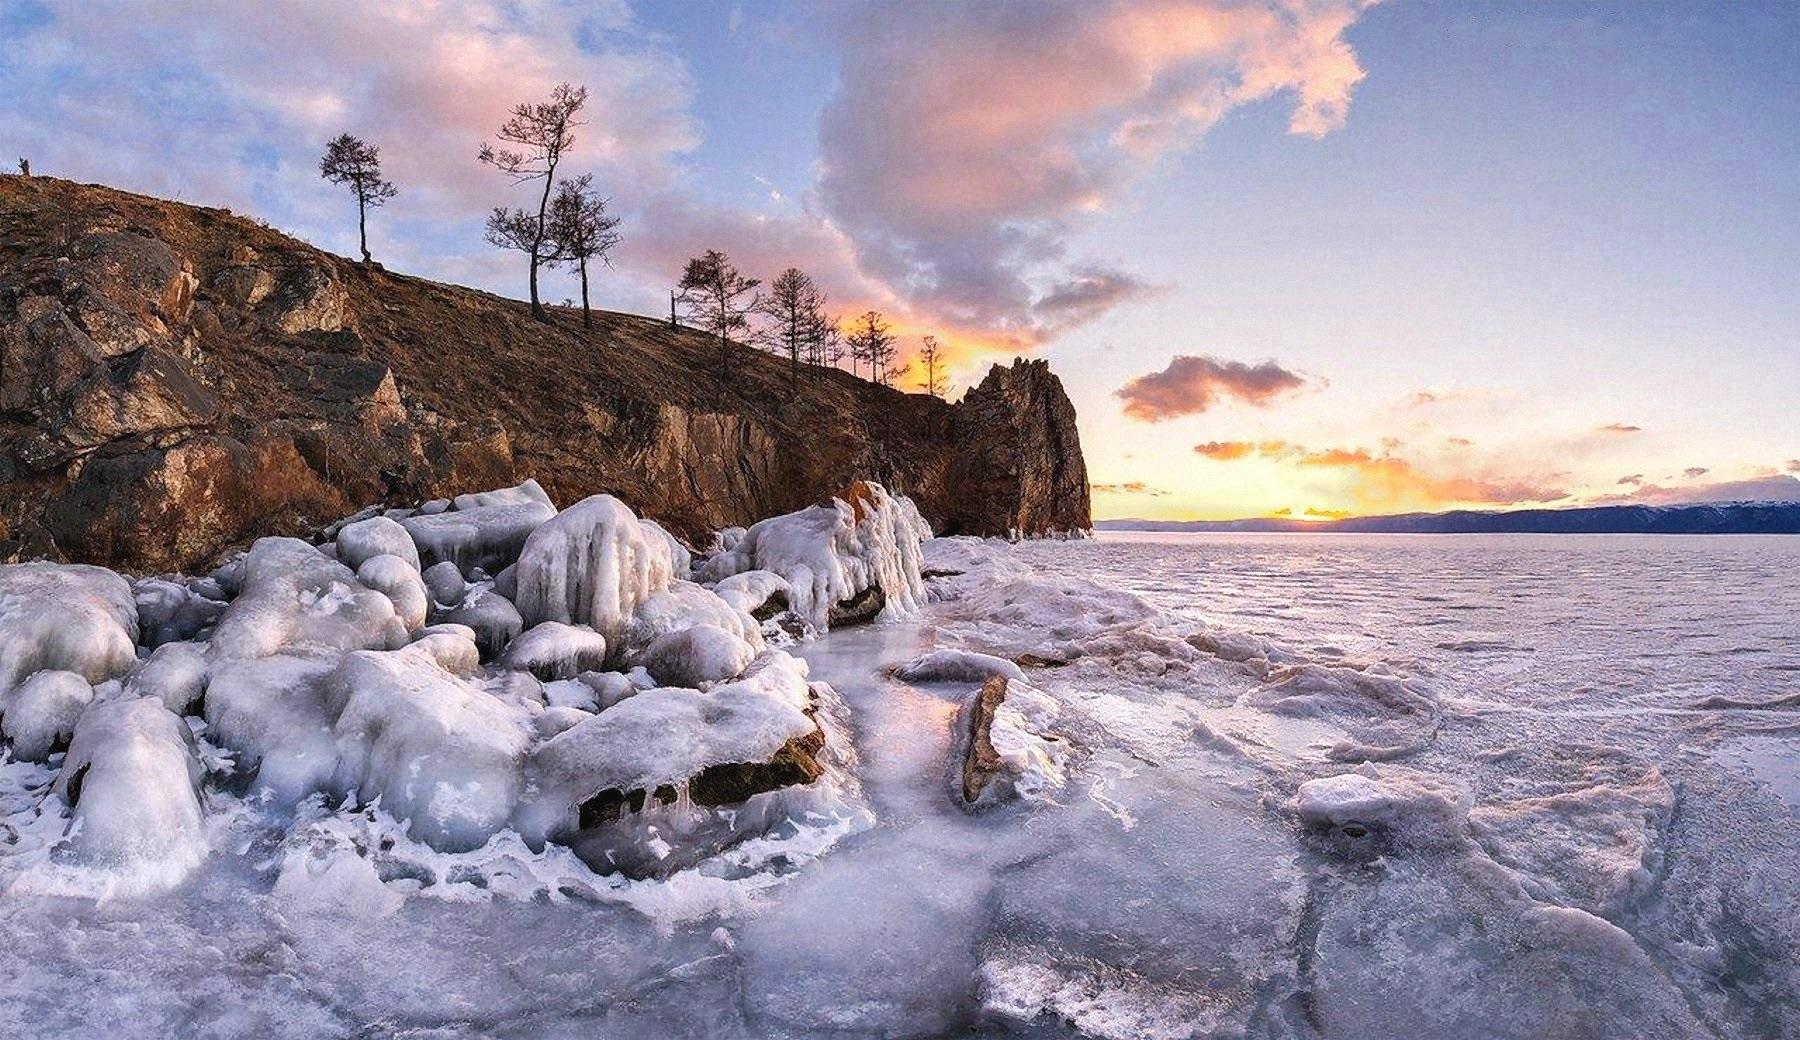 ... Anton Rostovsky. Sunset near Olkhon Island. Lake Baikal, Russia. 2015